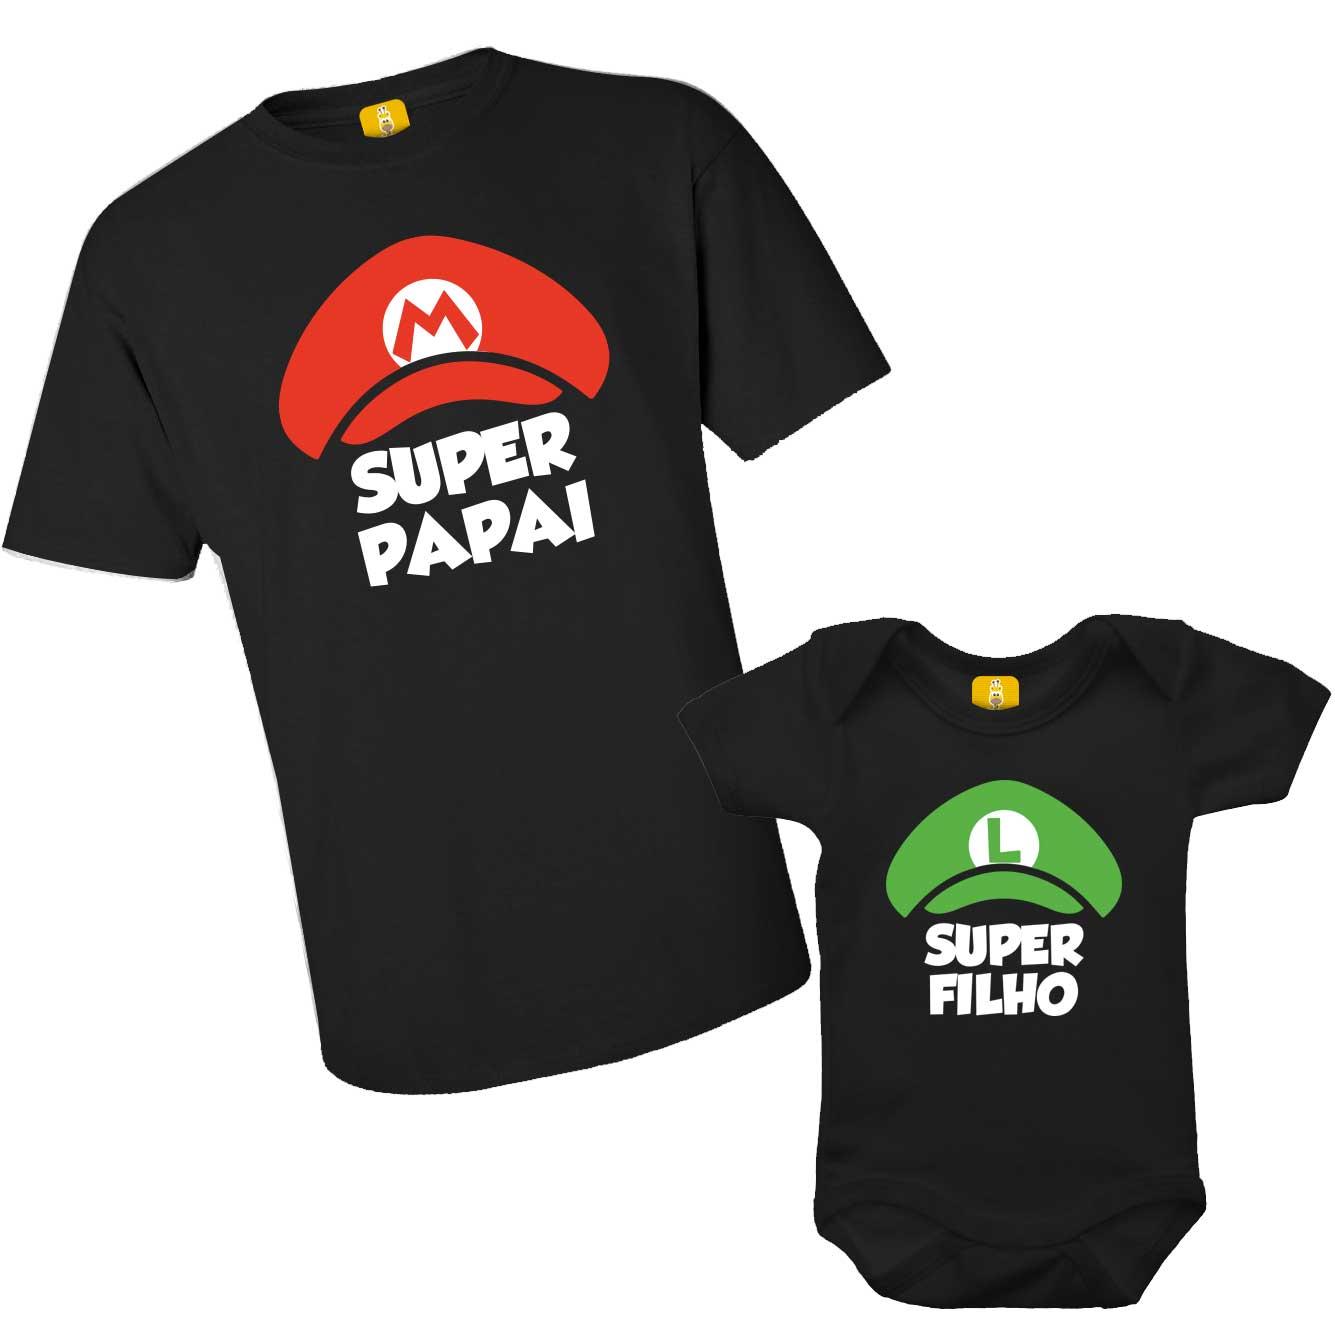 Kit camiseta e body - Super papai e super filho Mario Luigi